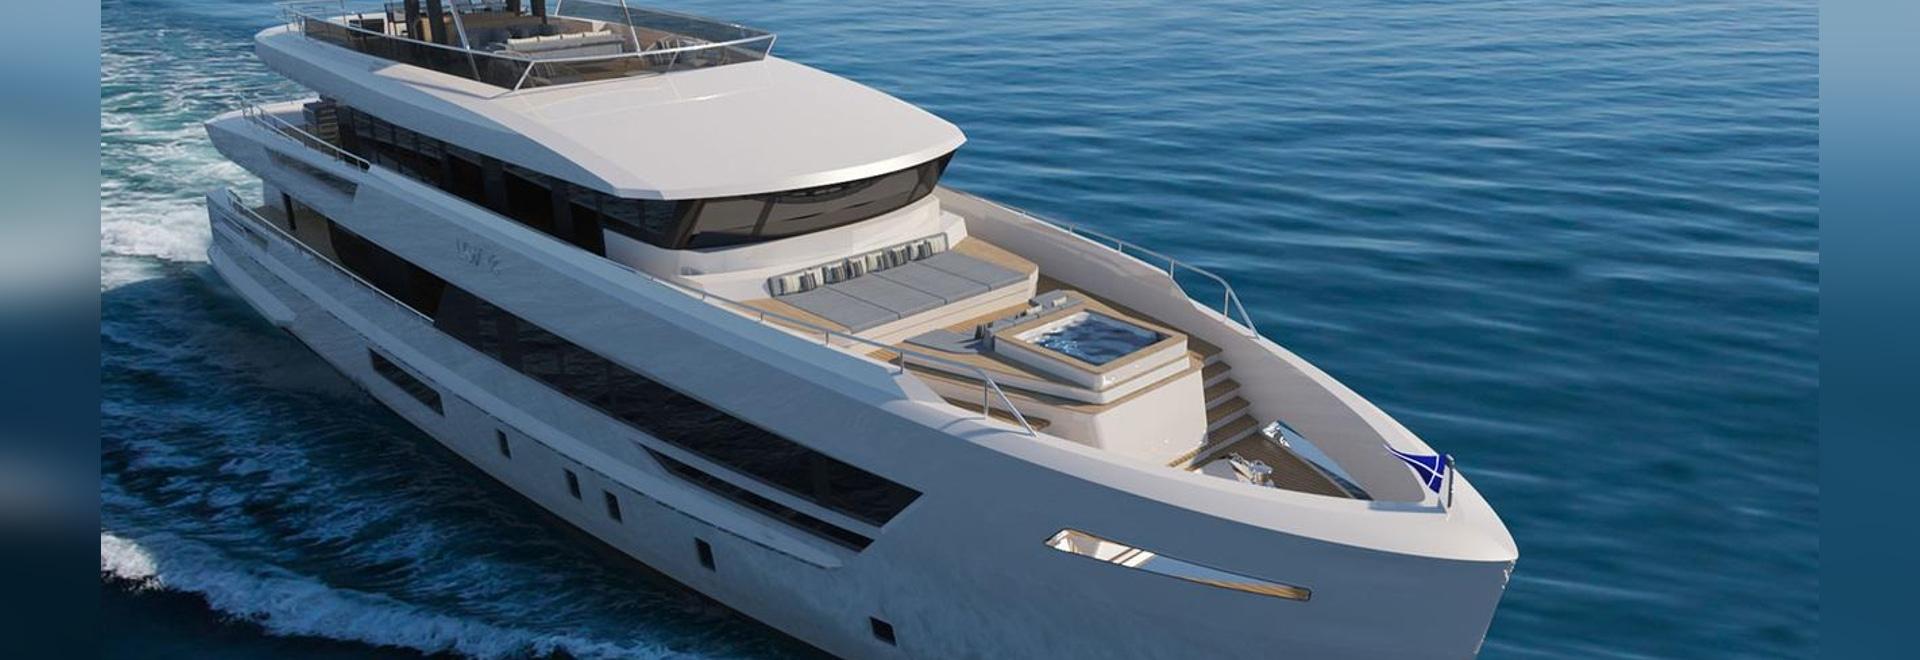 Lynx Yachts launches LOV 38